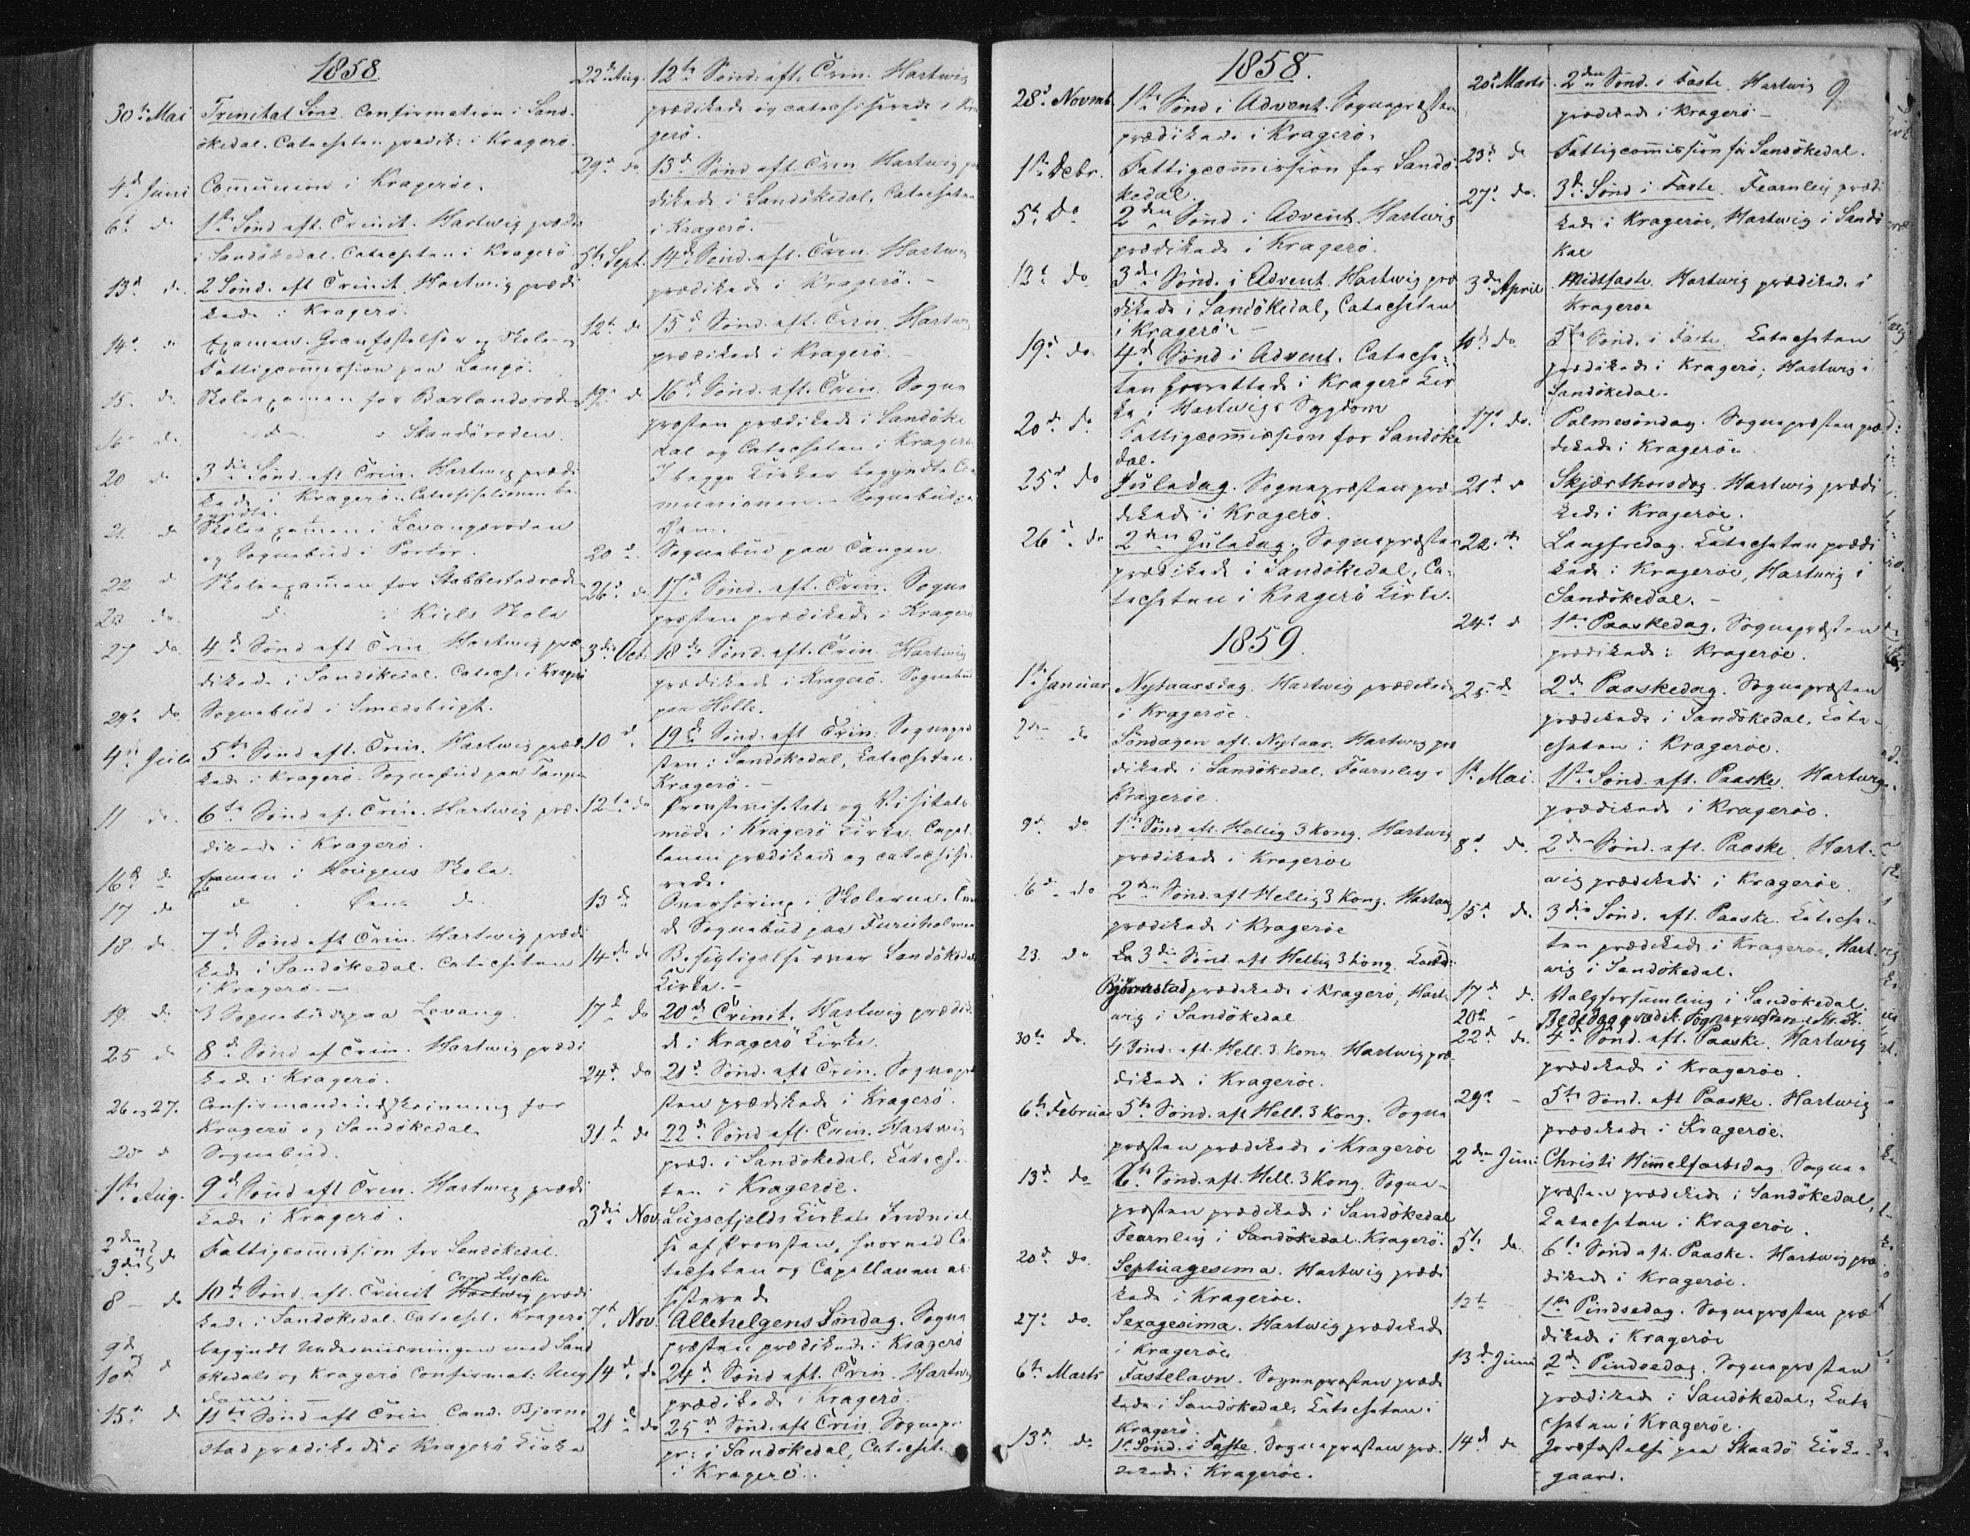 SAKO, Kragerø kirkebøker, F/Fa/L0006: Ministerialbok nr. 6, 1847-1861, s. 9